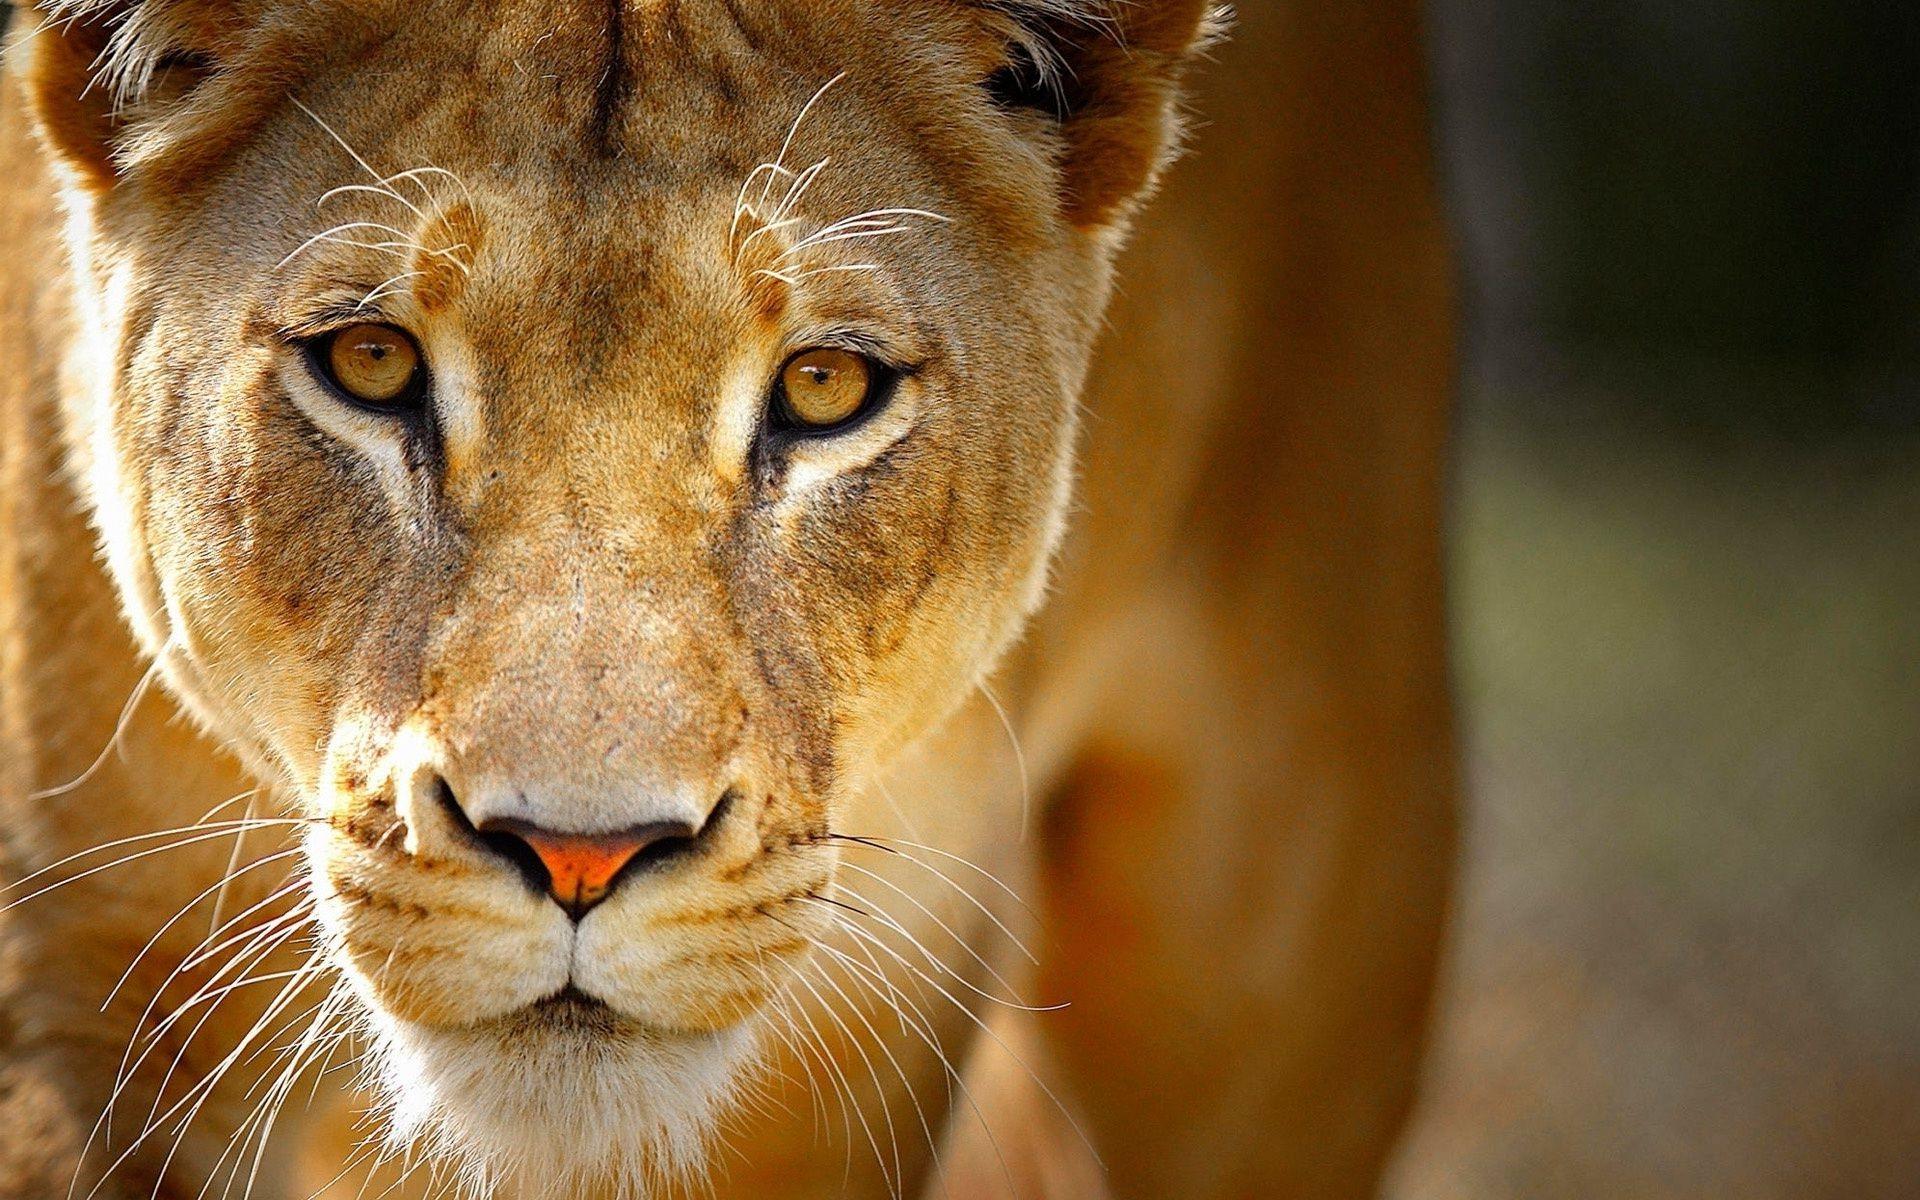 Lioness Lion Cub Lion Safari Africa Heat Nature Phone